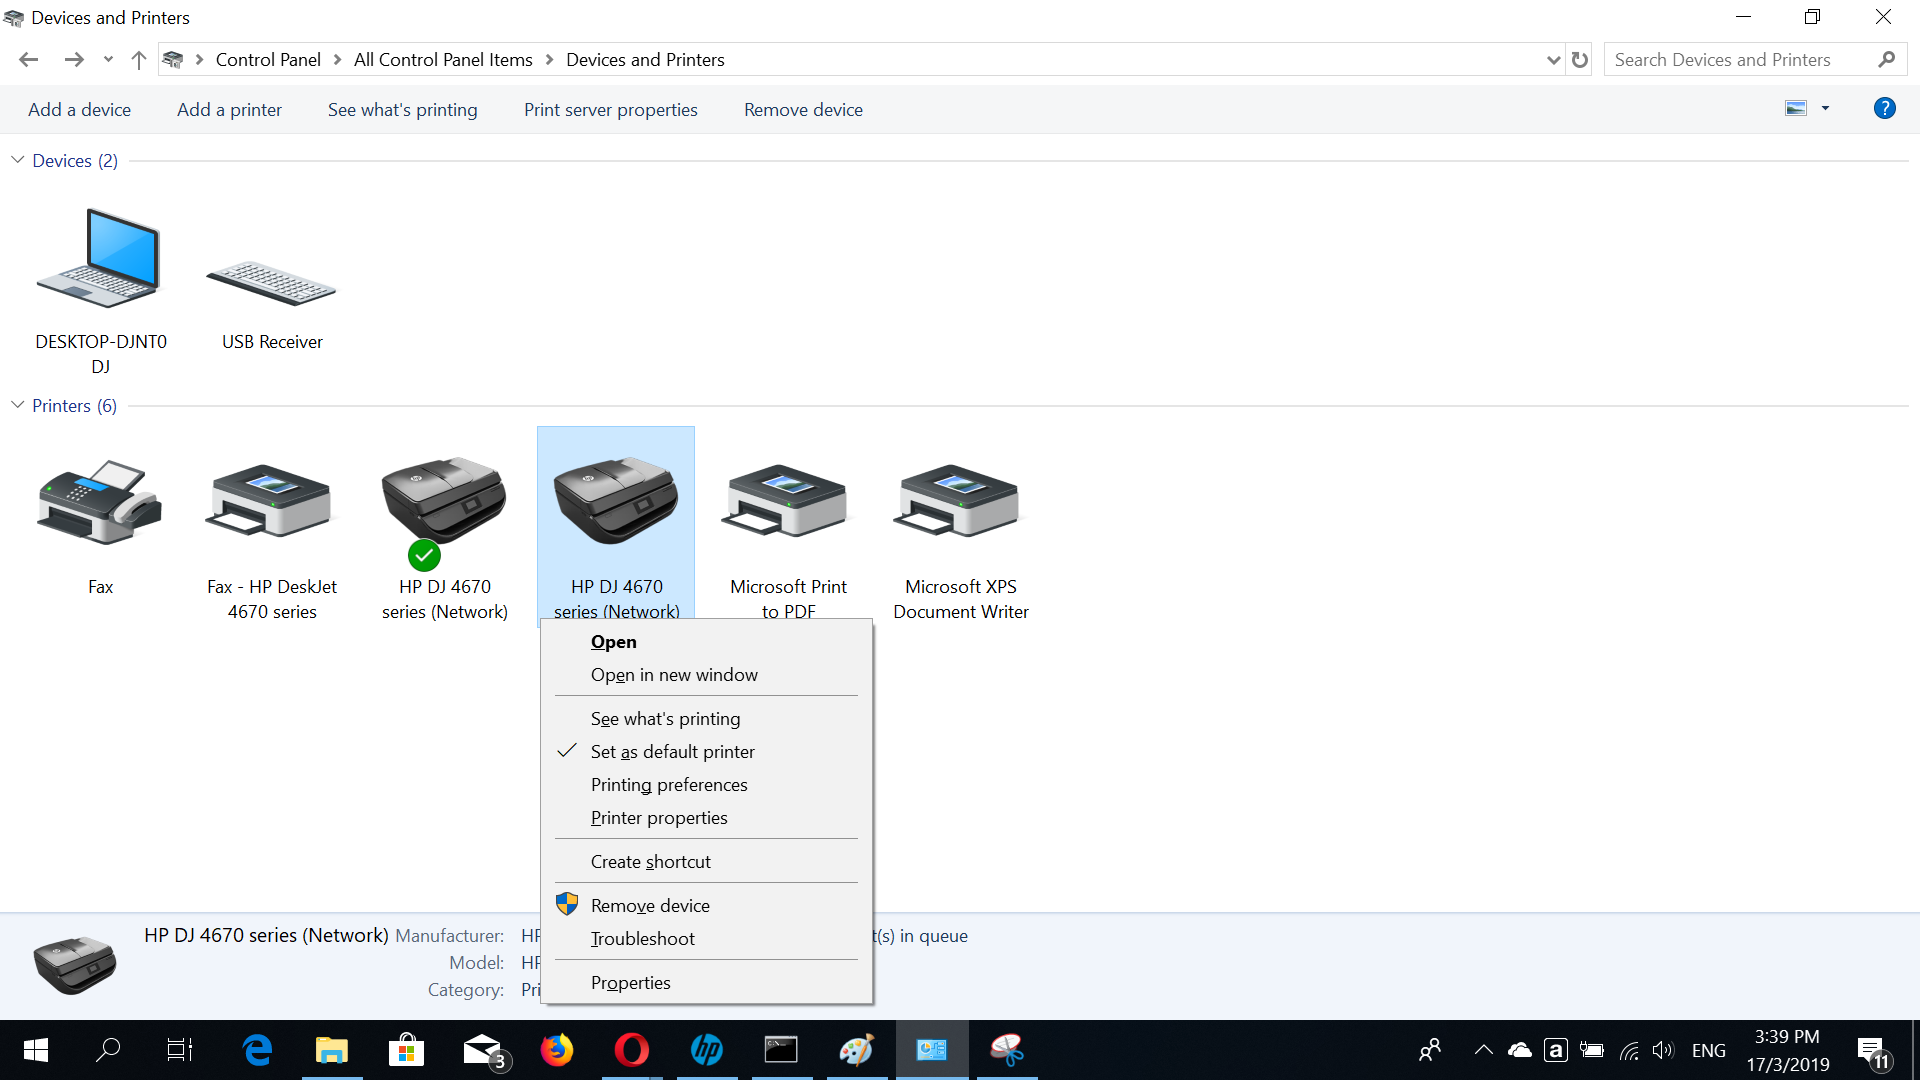 HP Deskjet Ink Advantage 4675: No option to print in